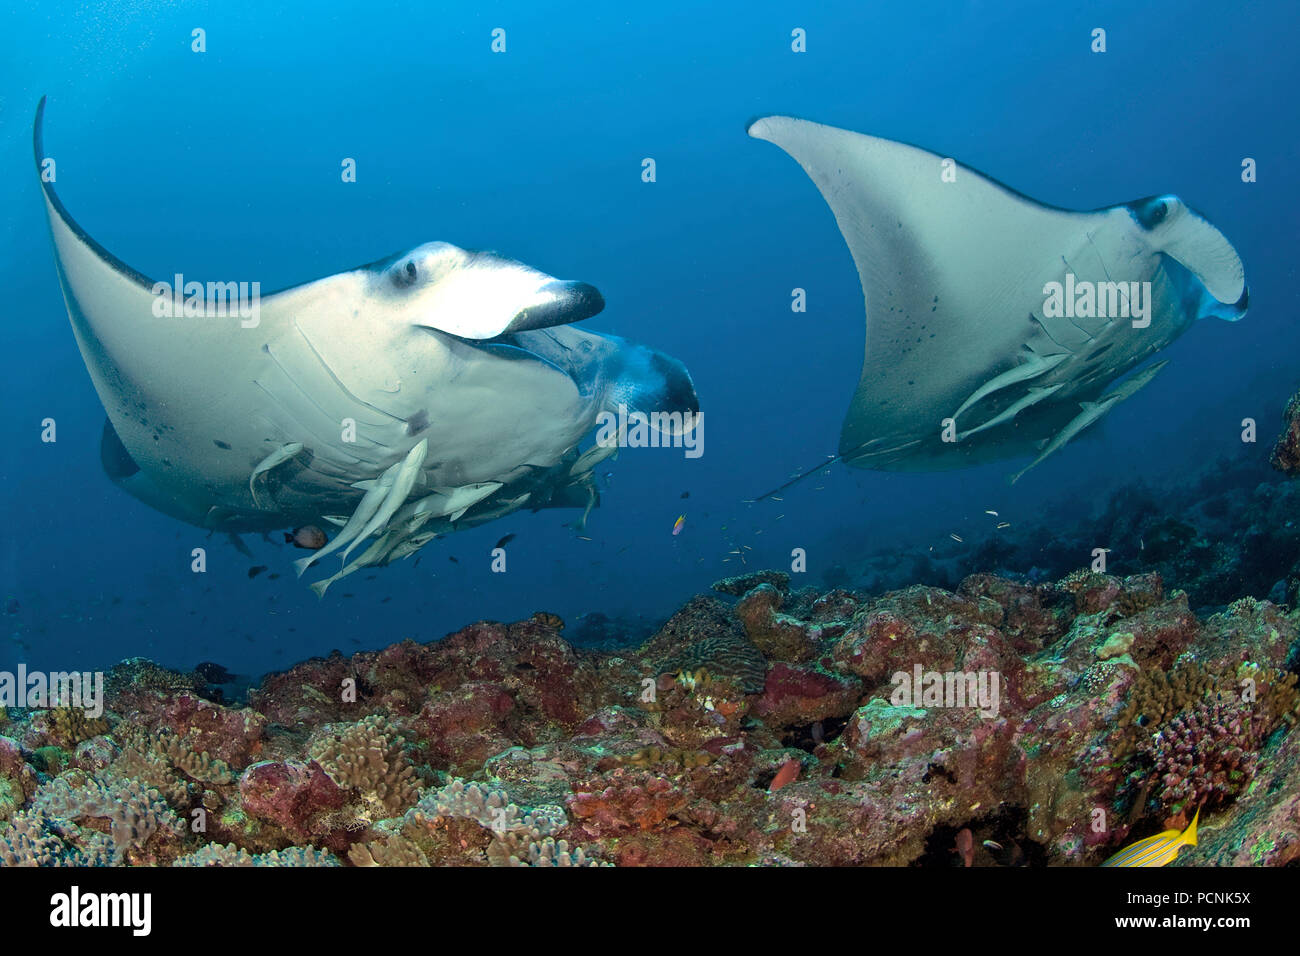 Two Giant oceanic manta rays (Manta birostris) with shark suckers (Remora remora), Yap, Micronesia - Stock Image